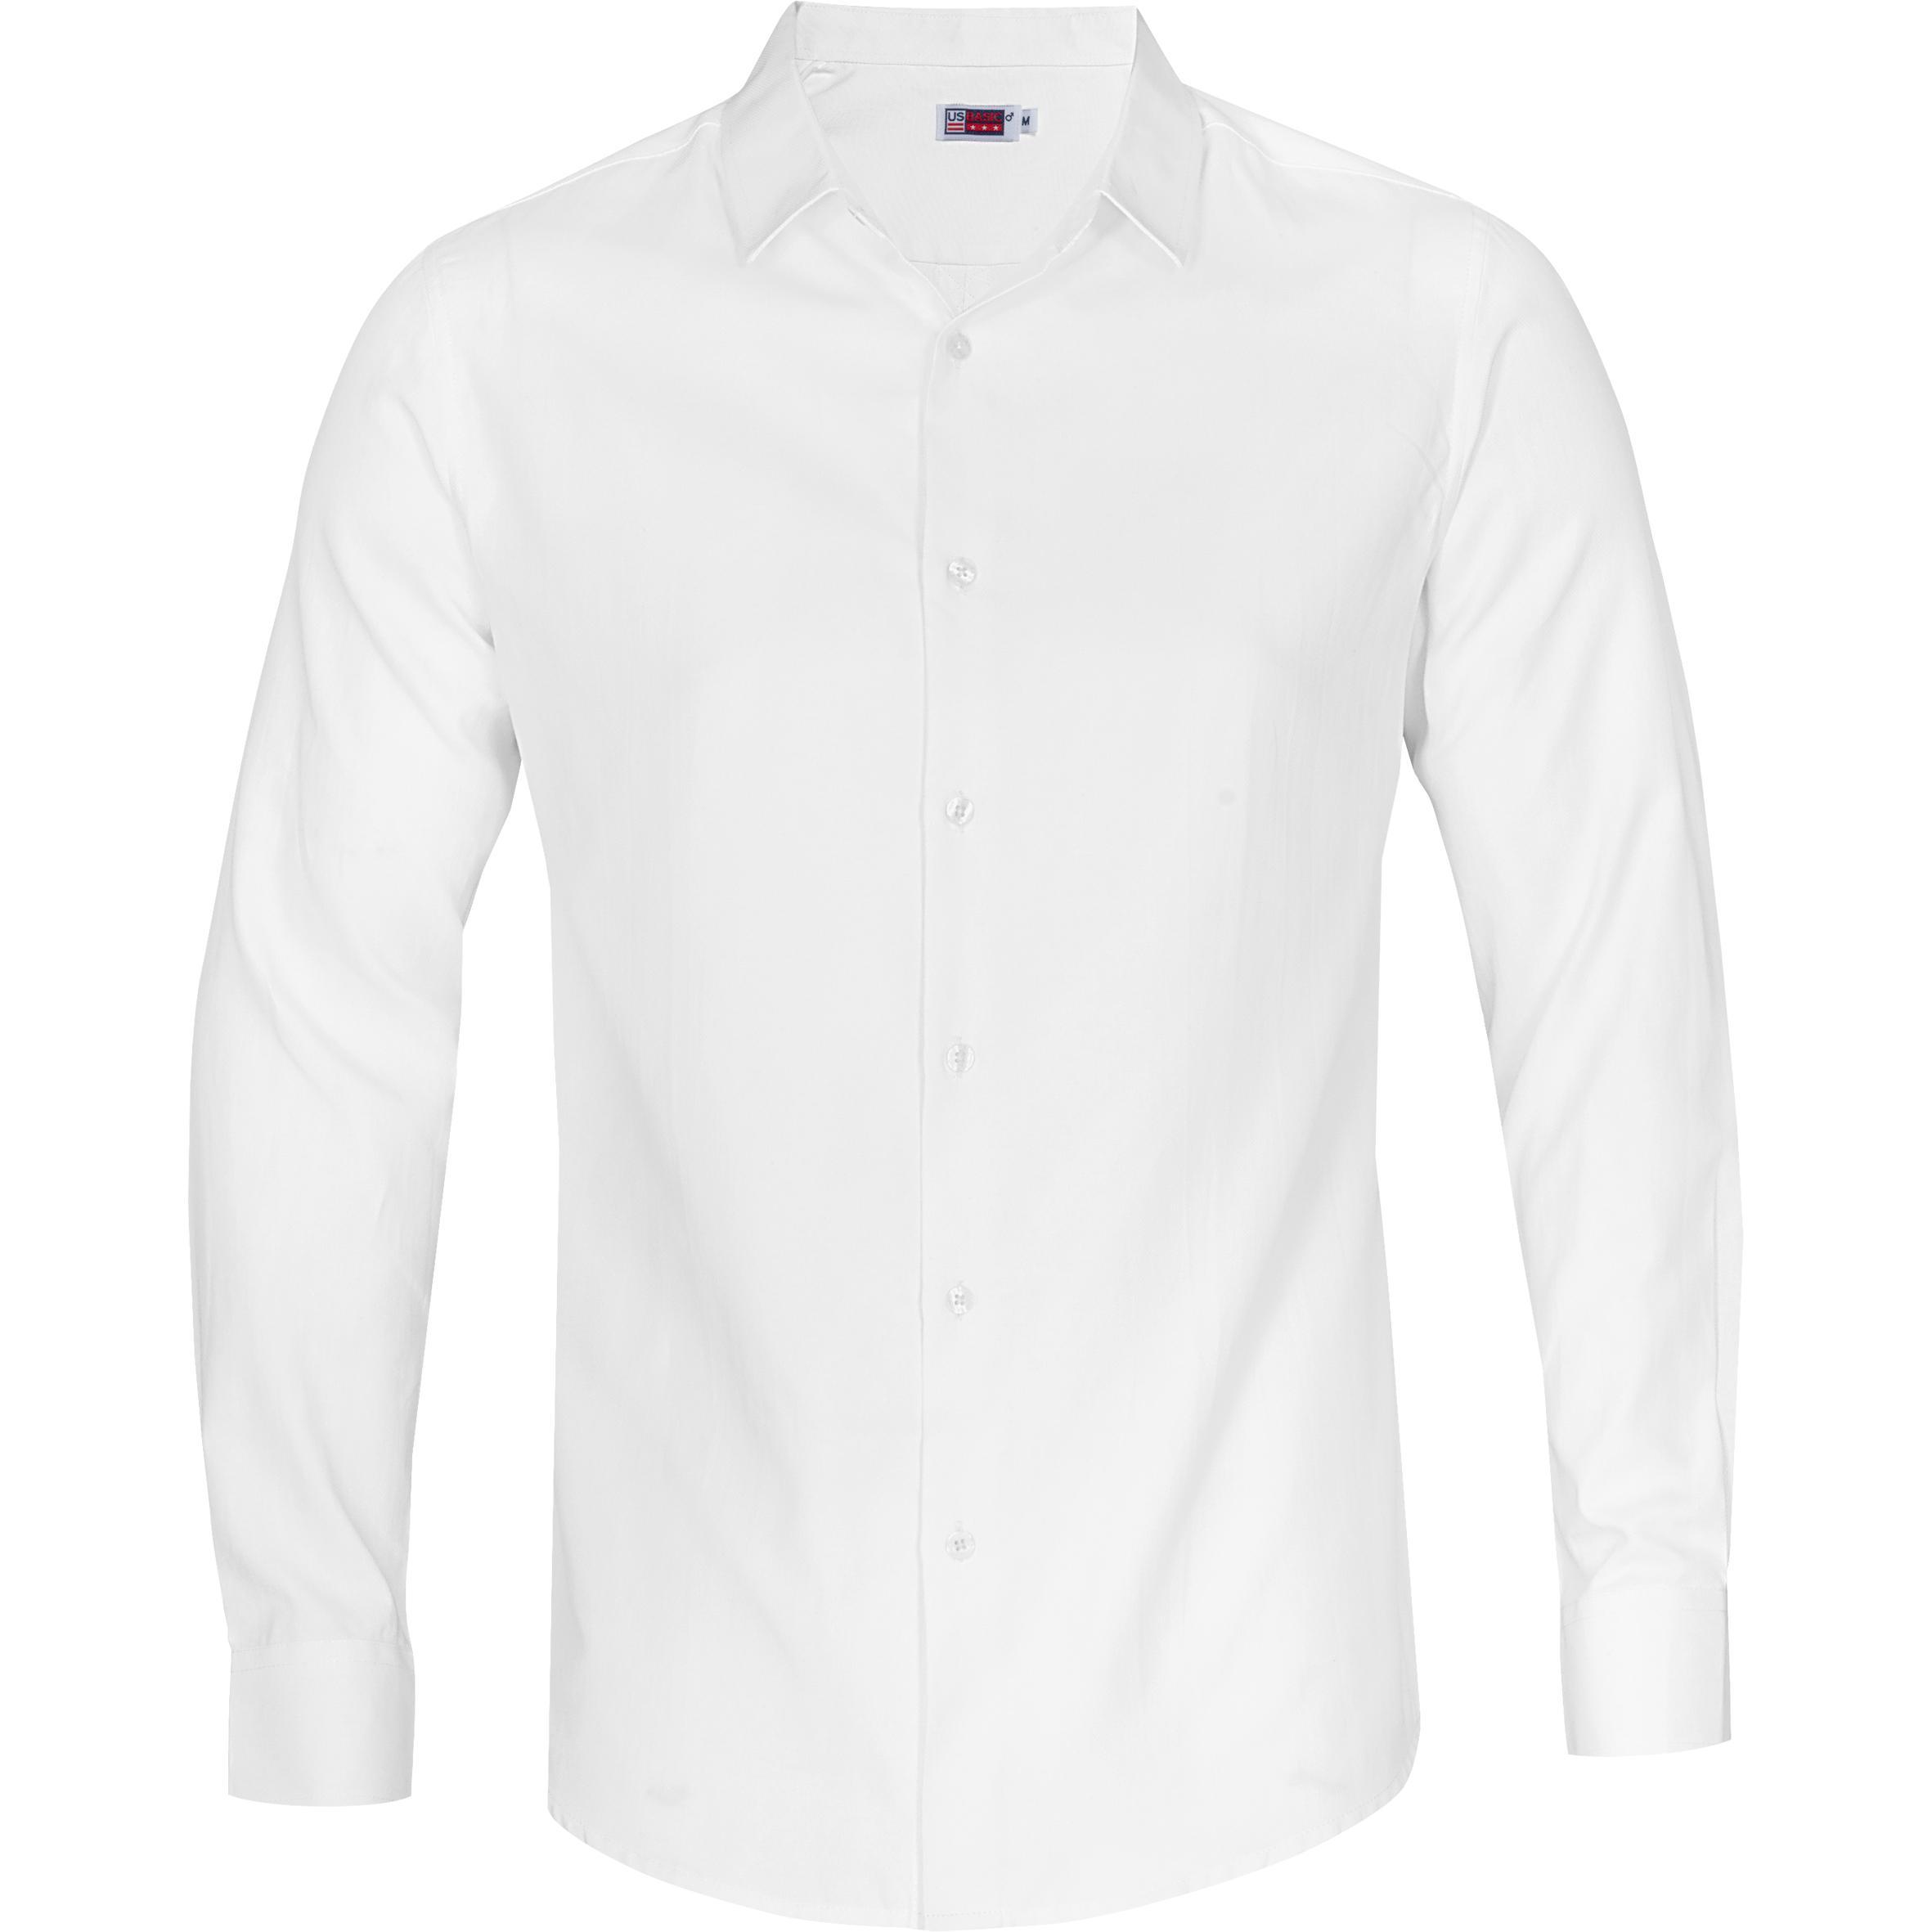 Mens Long Sleeve Wallstreet Shirt